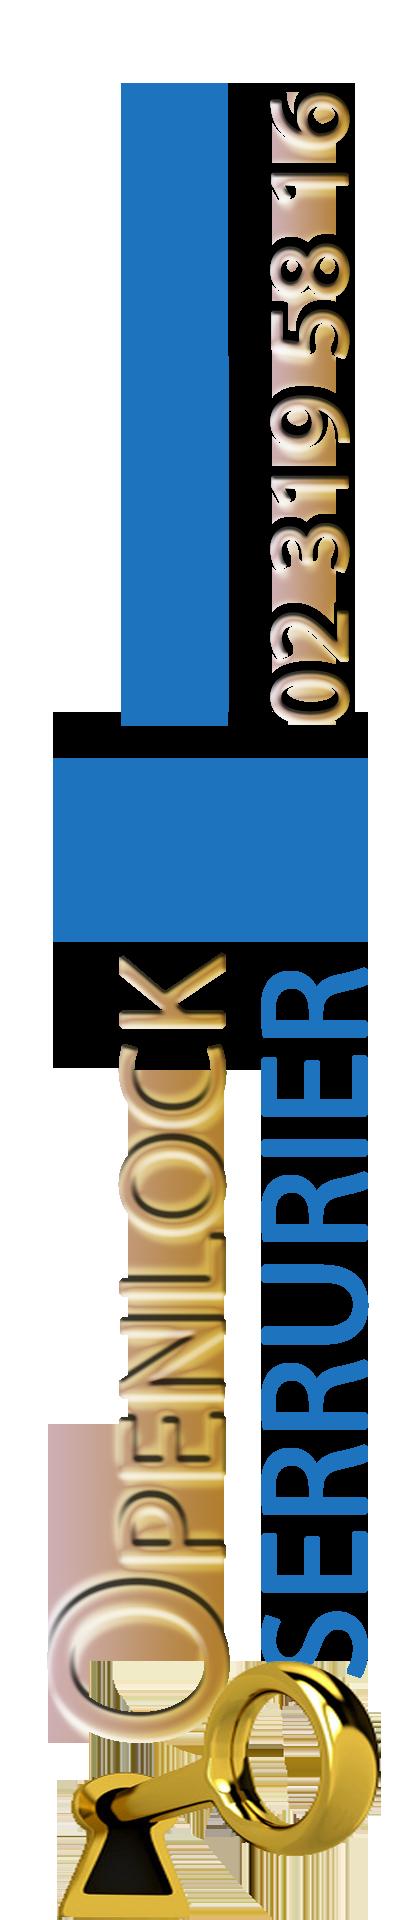 Openlock Serrurier Bruxelles 0495 998 060 - Serrurier Urgence